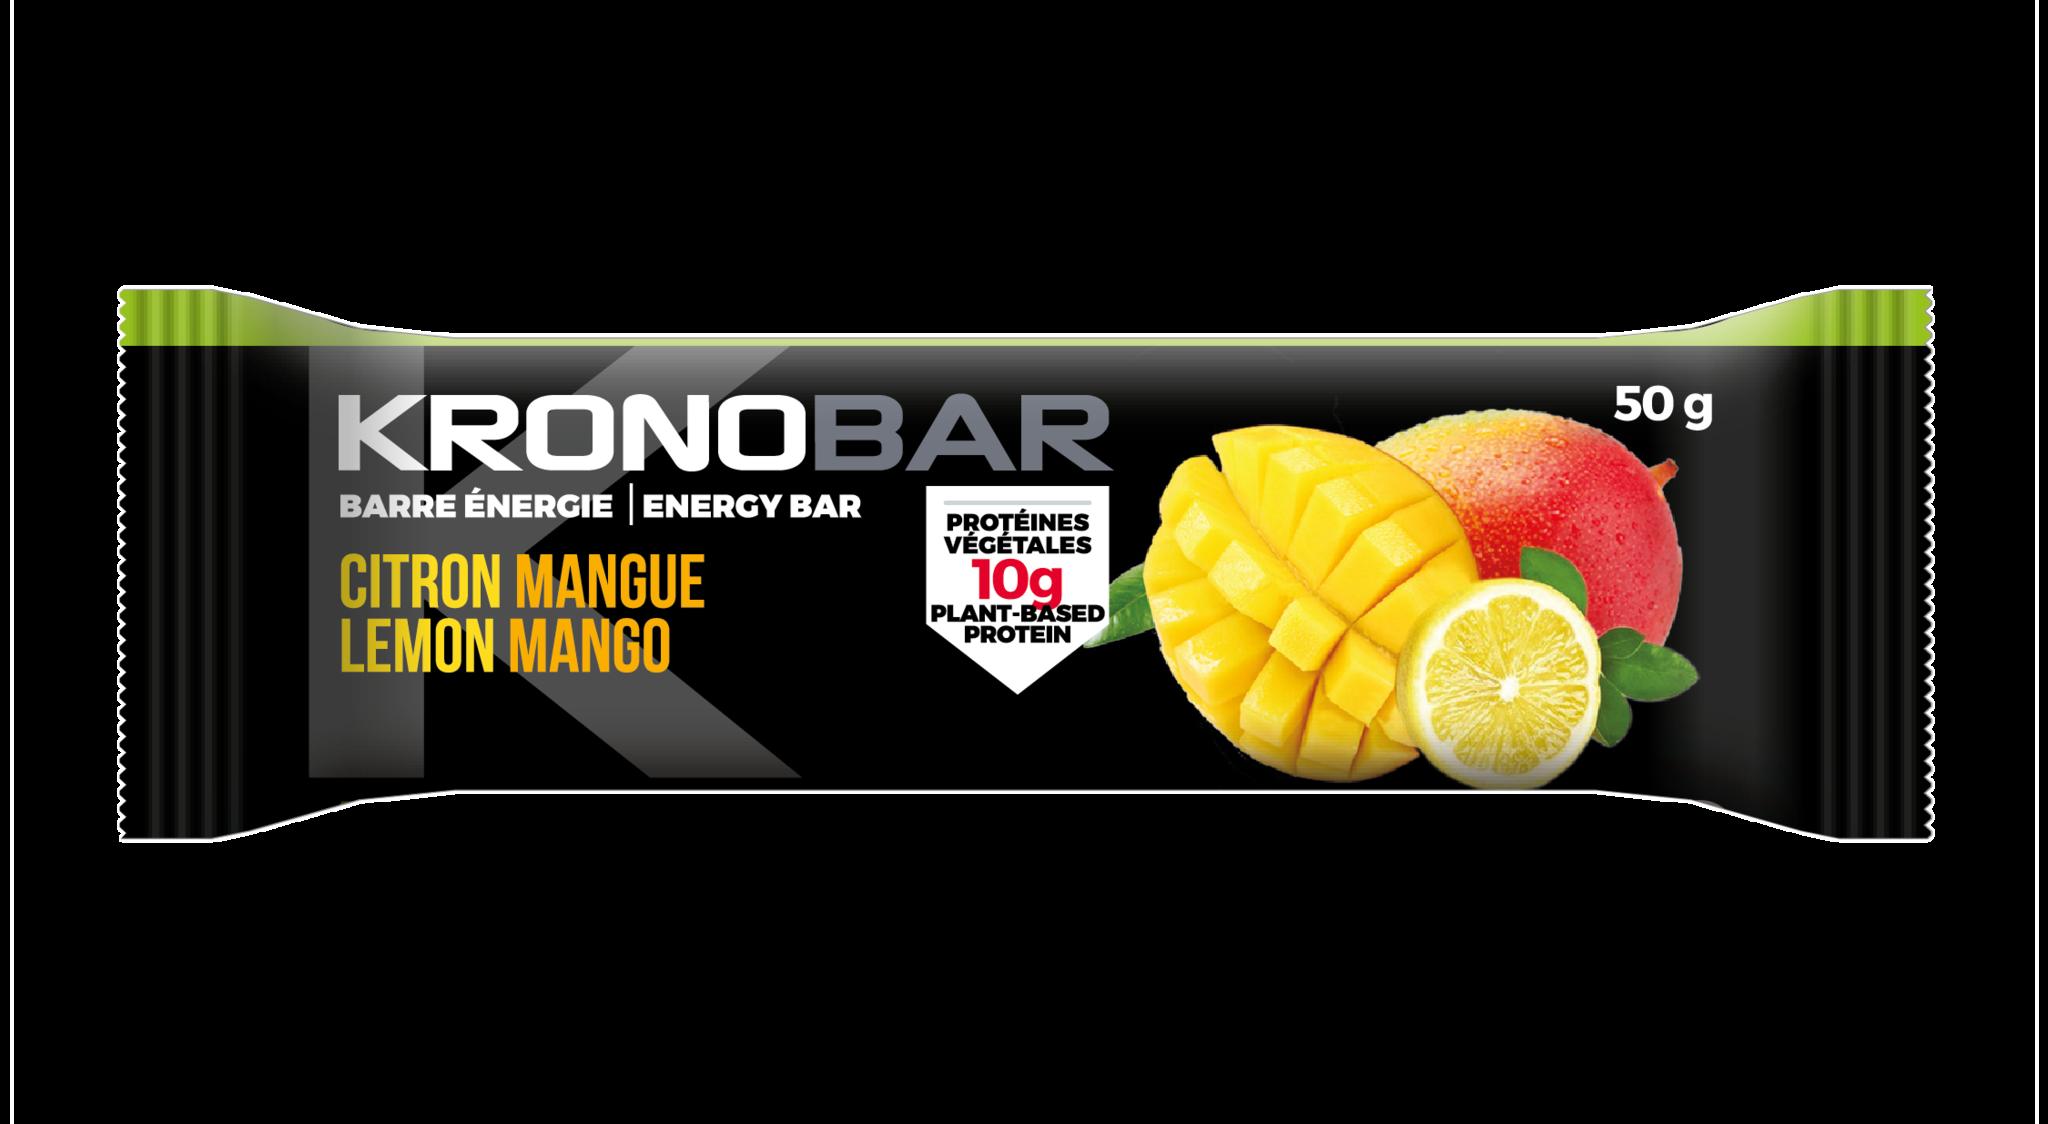 Barre endurance Kronobar Citron/Mangue 50g